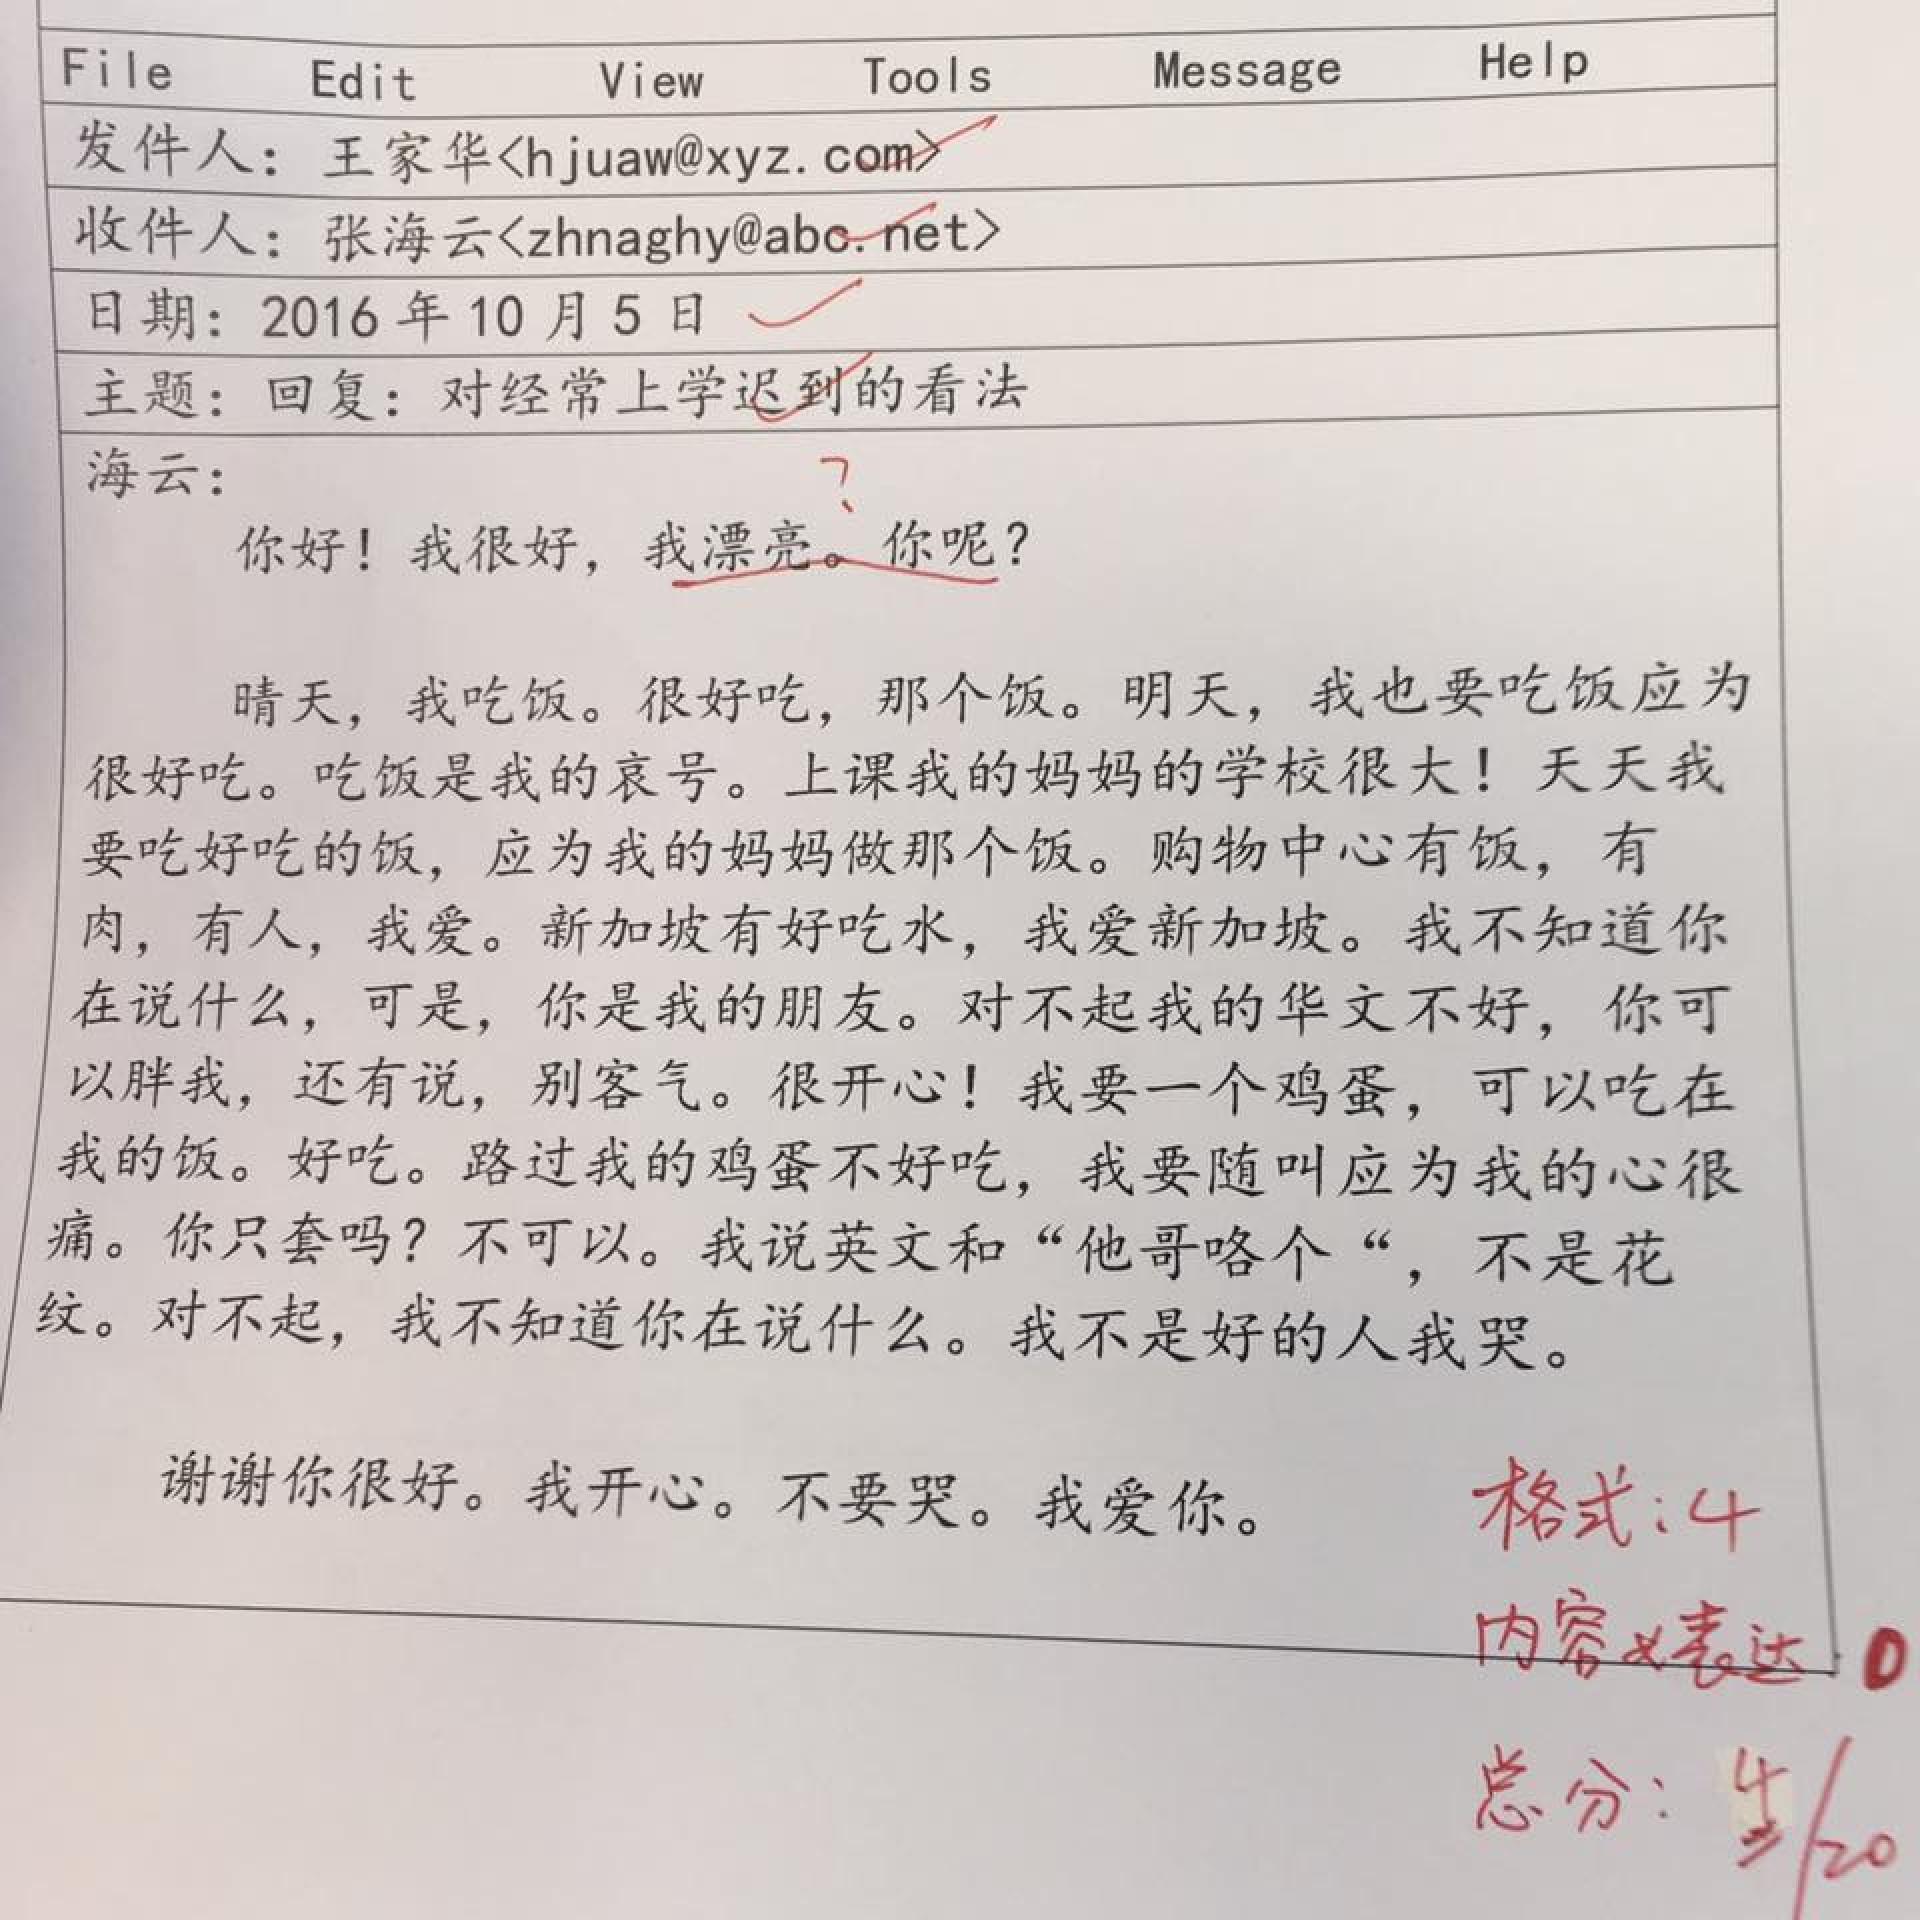 001 Chinese Essay Amazing Art Topics Vce Formats Sheet 1920